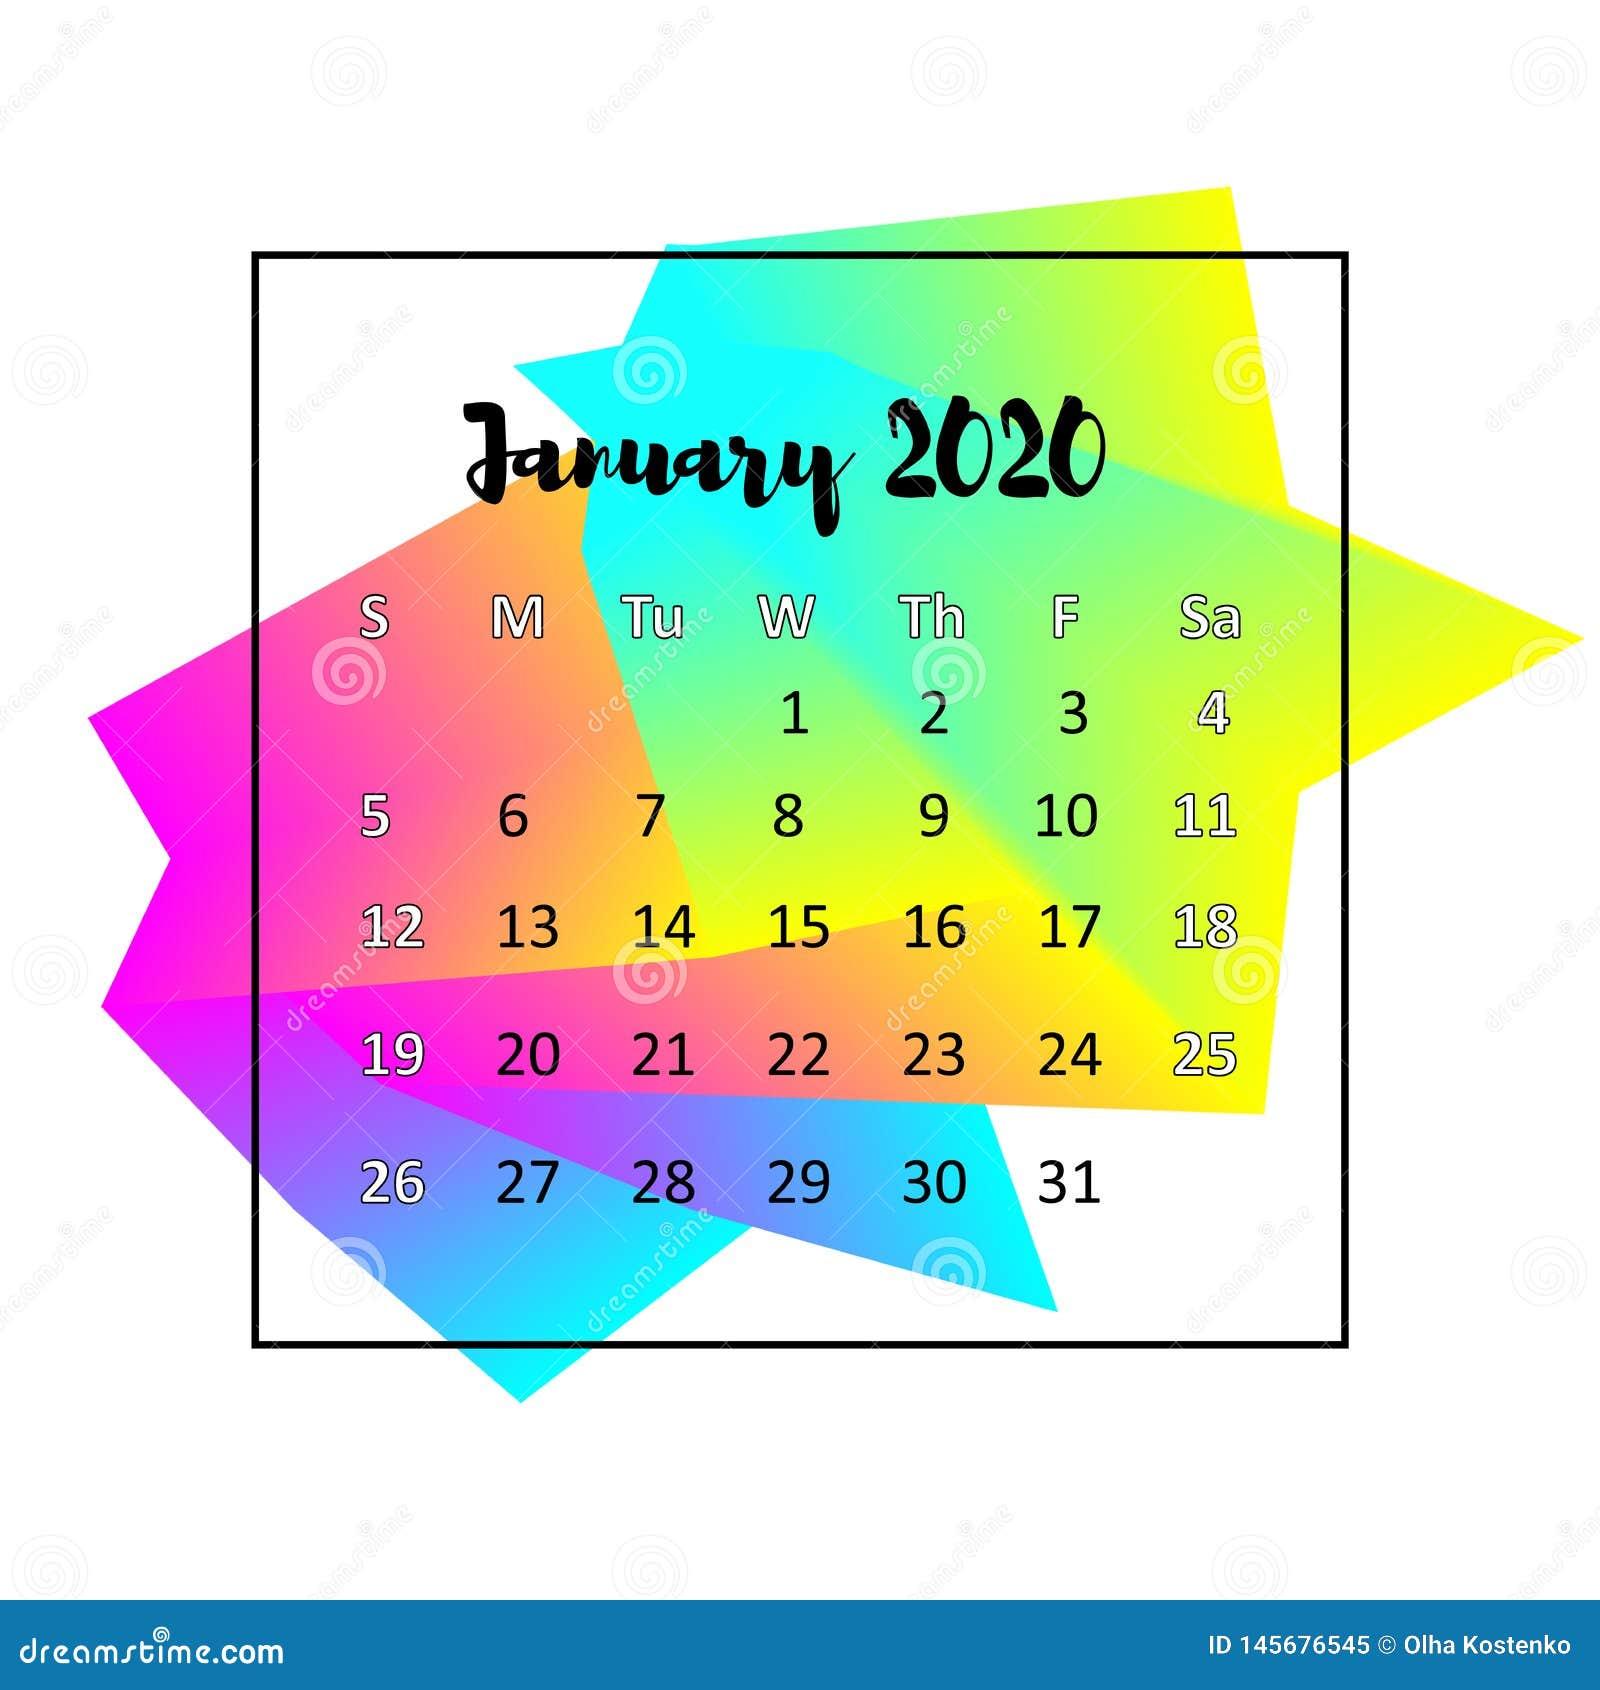 January 2020 Calendar Design 2020 Calendar Design Abstract Concept. January 2020. Stock Vector